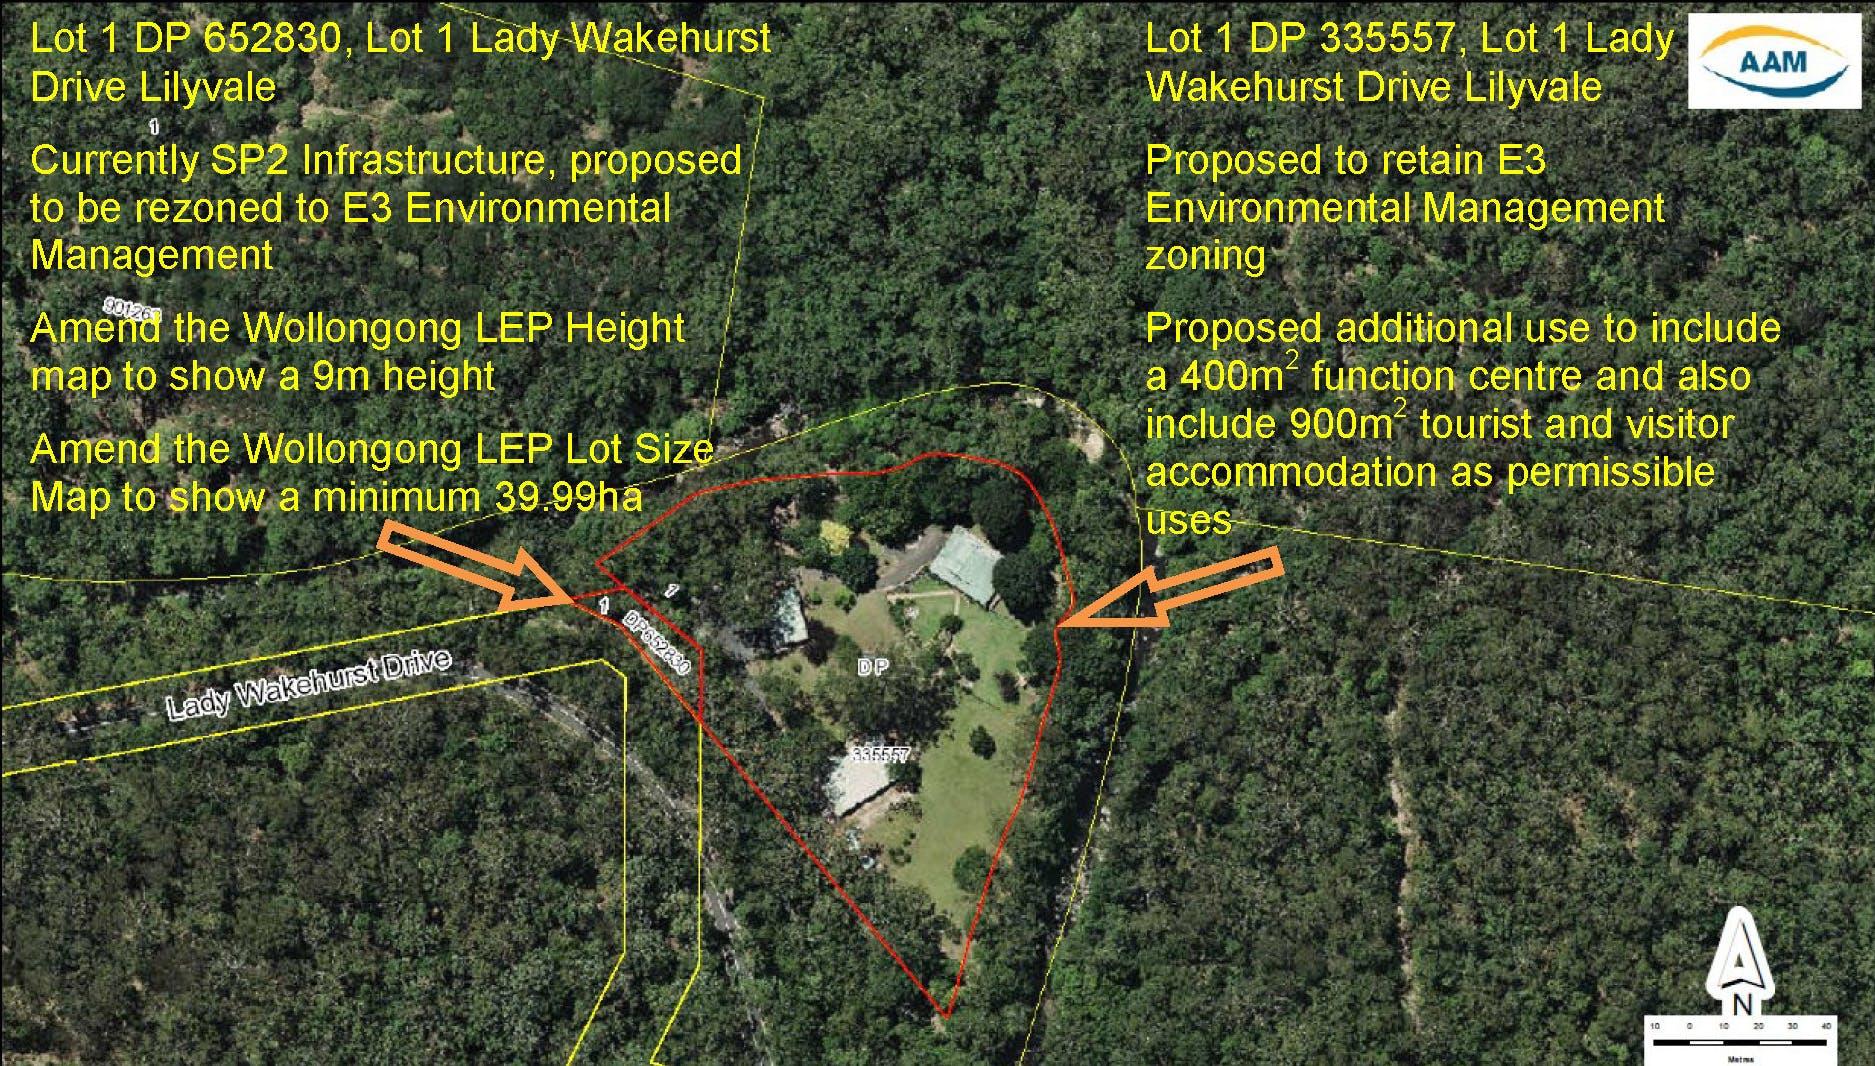 Map Of Lady Wakehurst Drive Lilyvale Preliminary Notification Exhibition